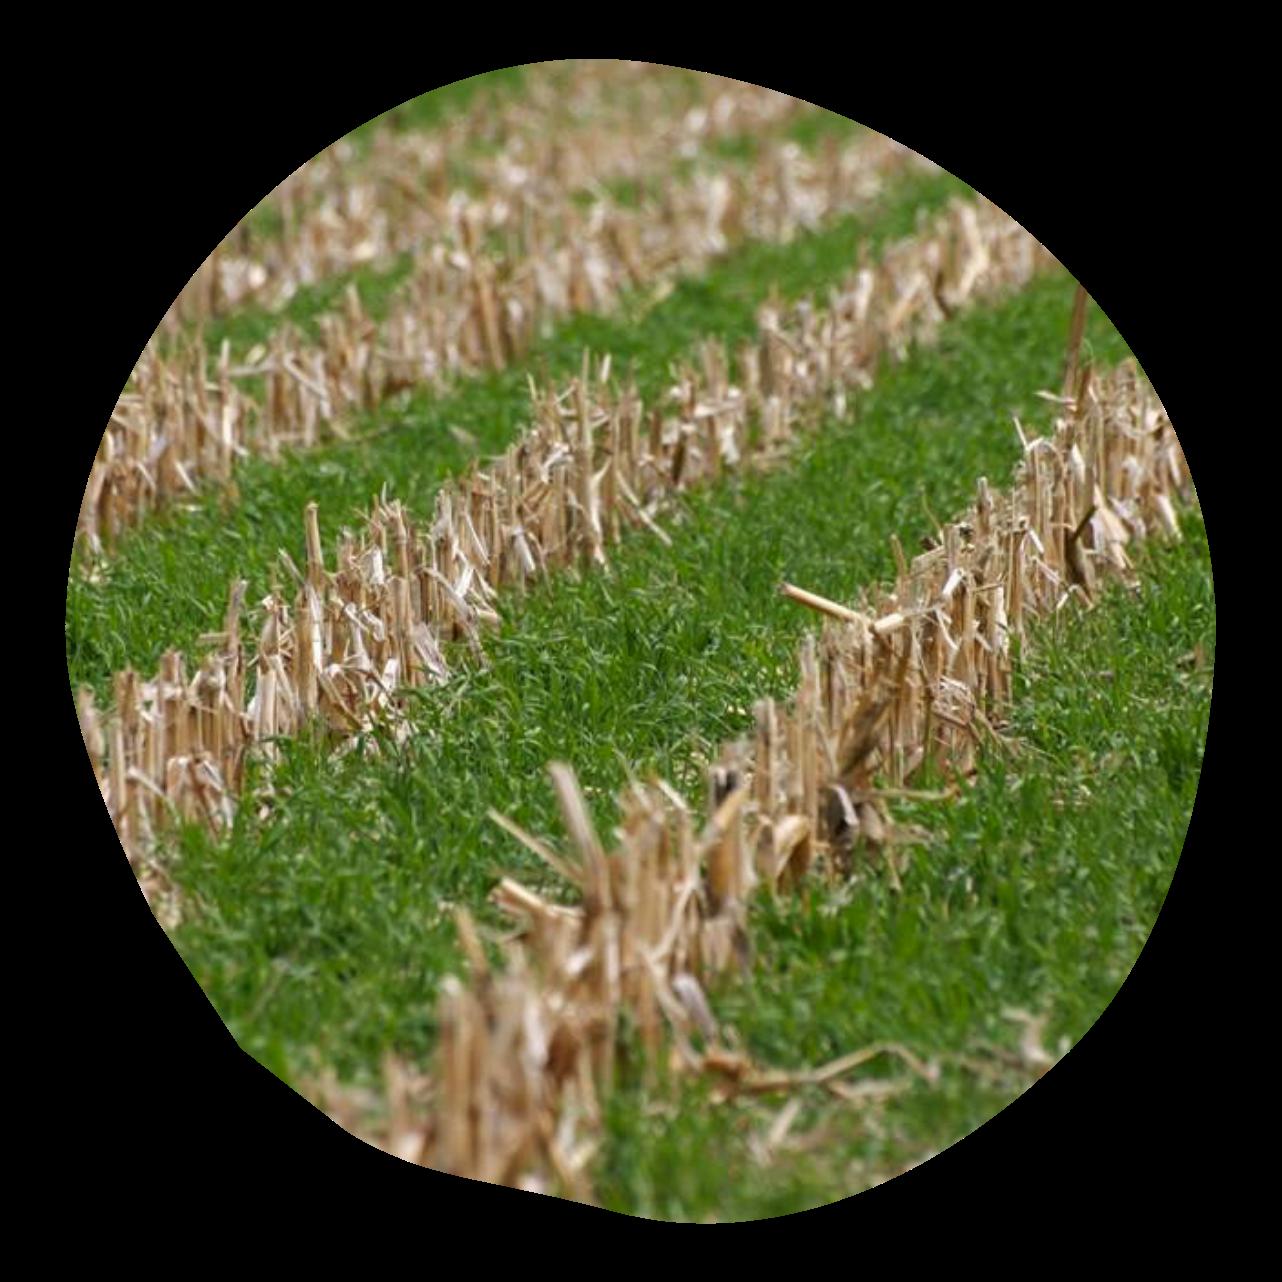 Klim Methode Cover Crops